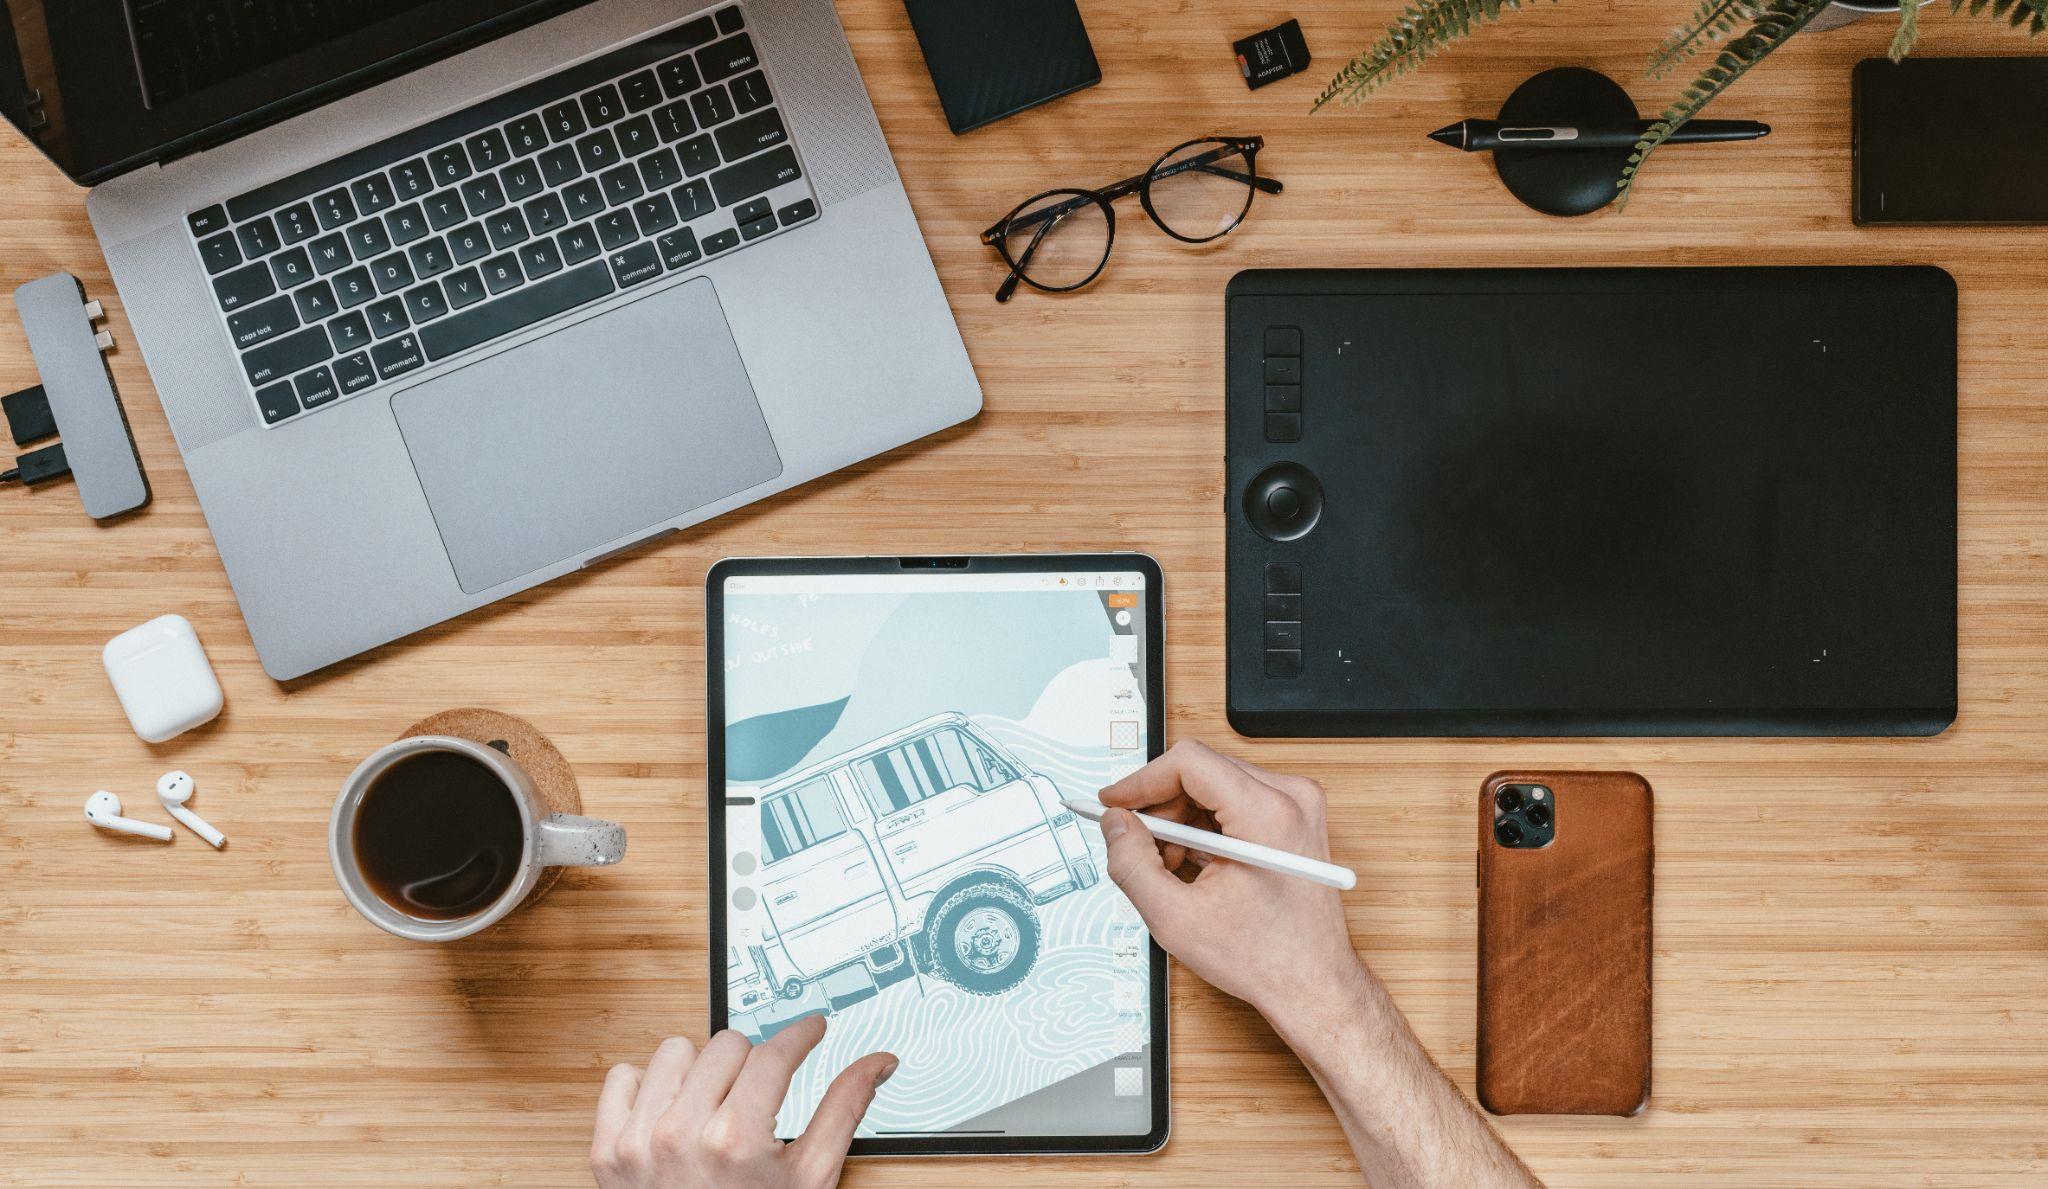 Top 10 Digital Art Tips and Techniques